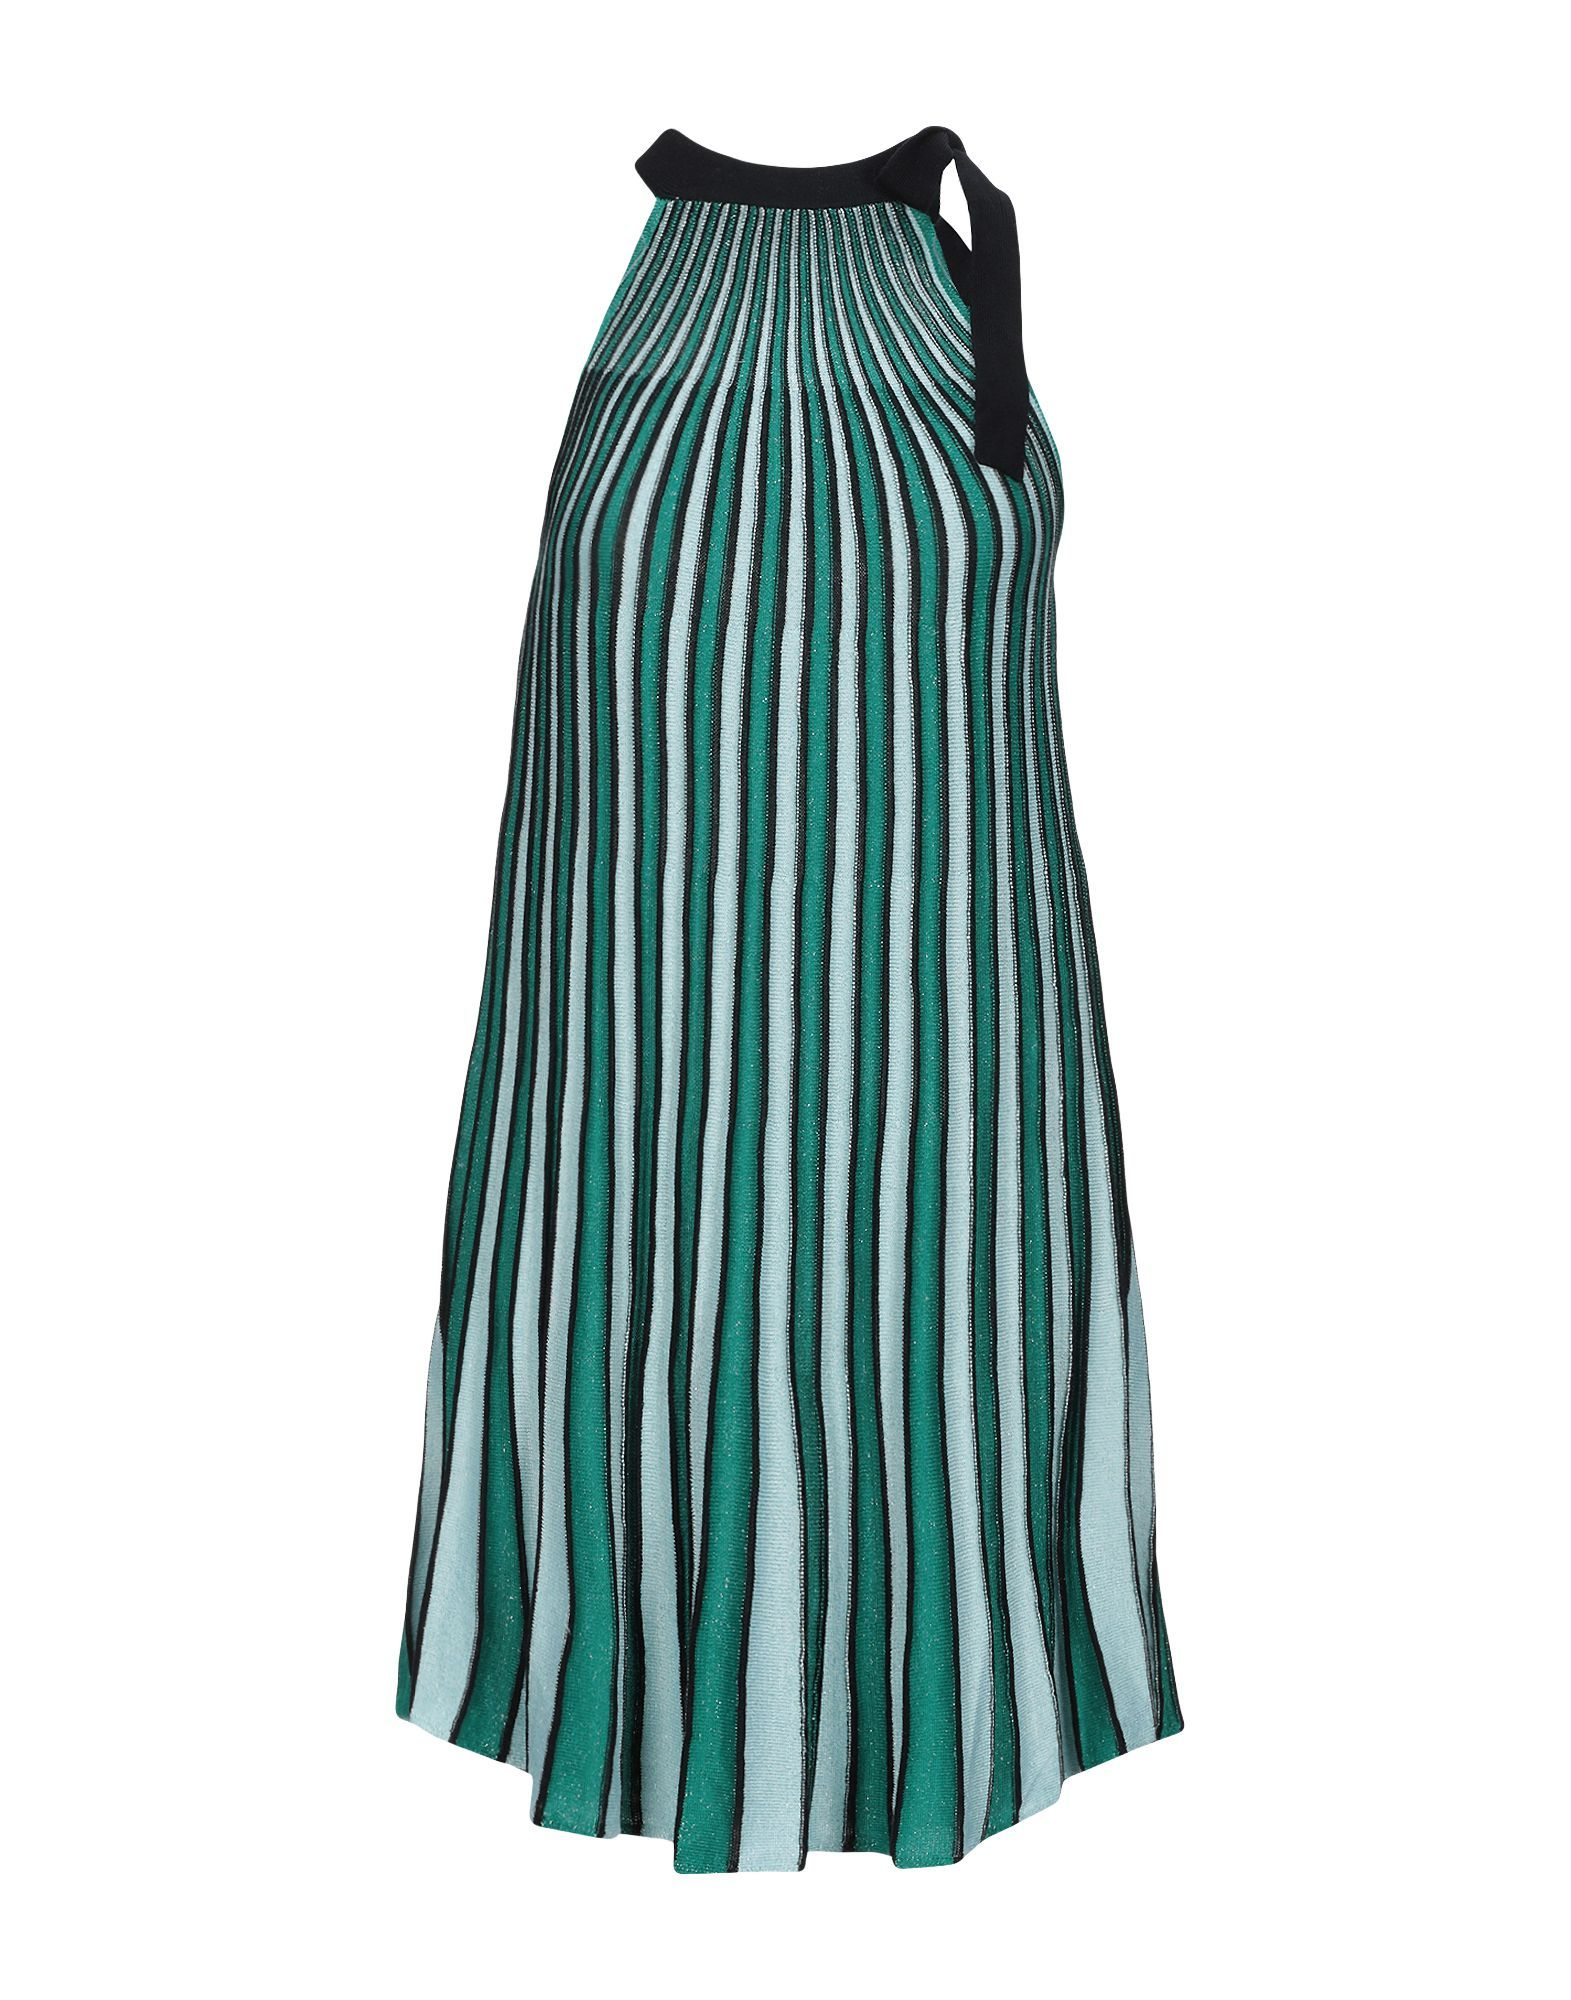 Only Green Stripe Sleeveless Dress